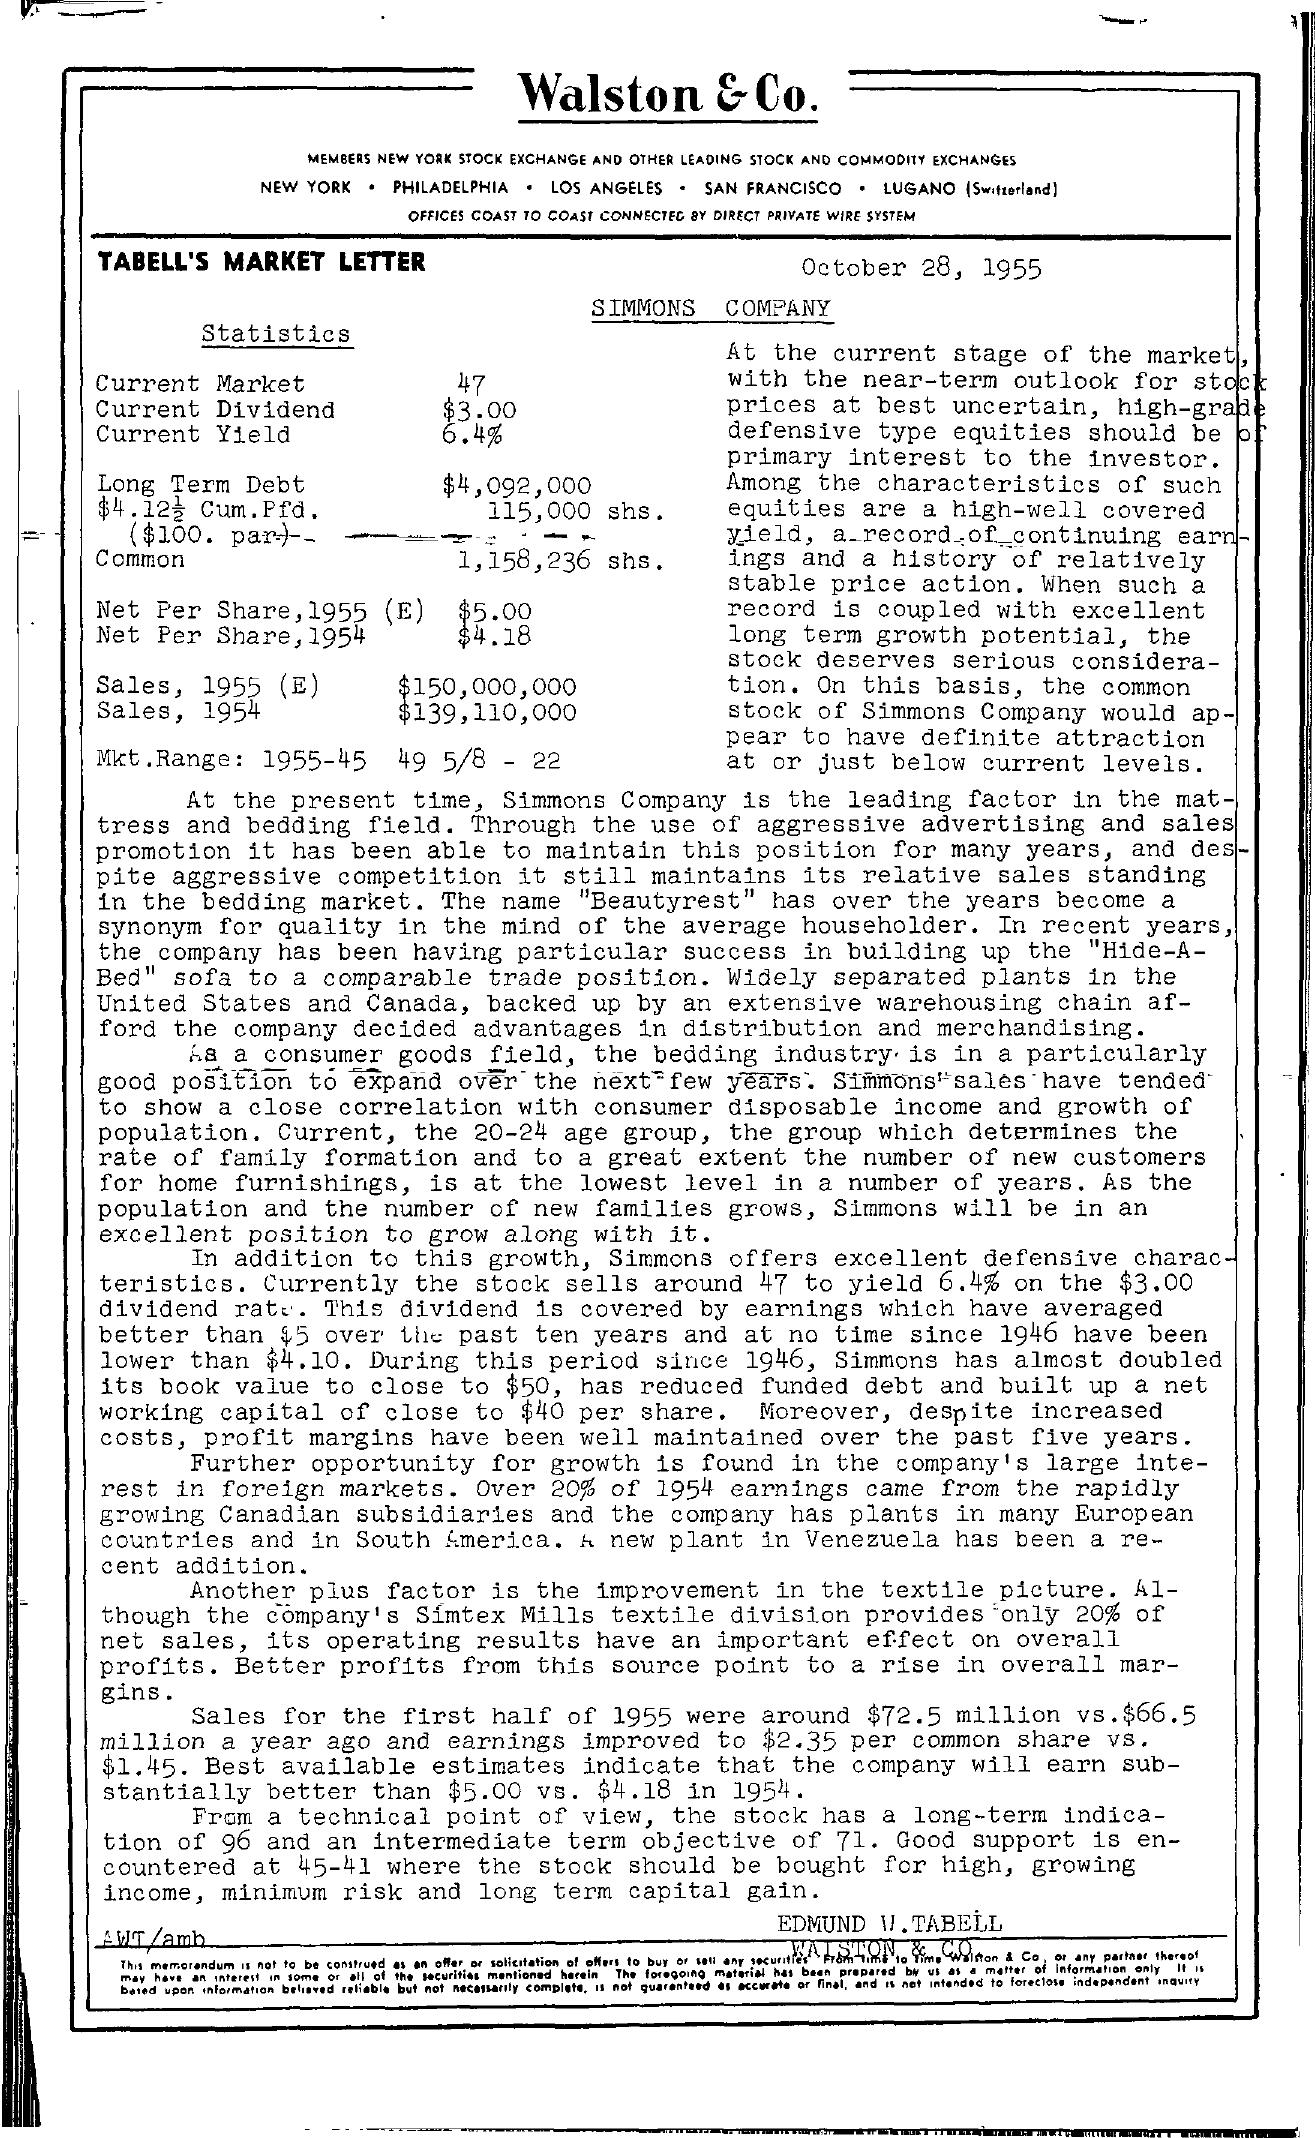 Tabell's Market Letter - October 28, 1955